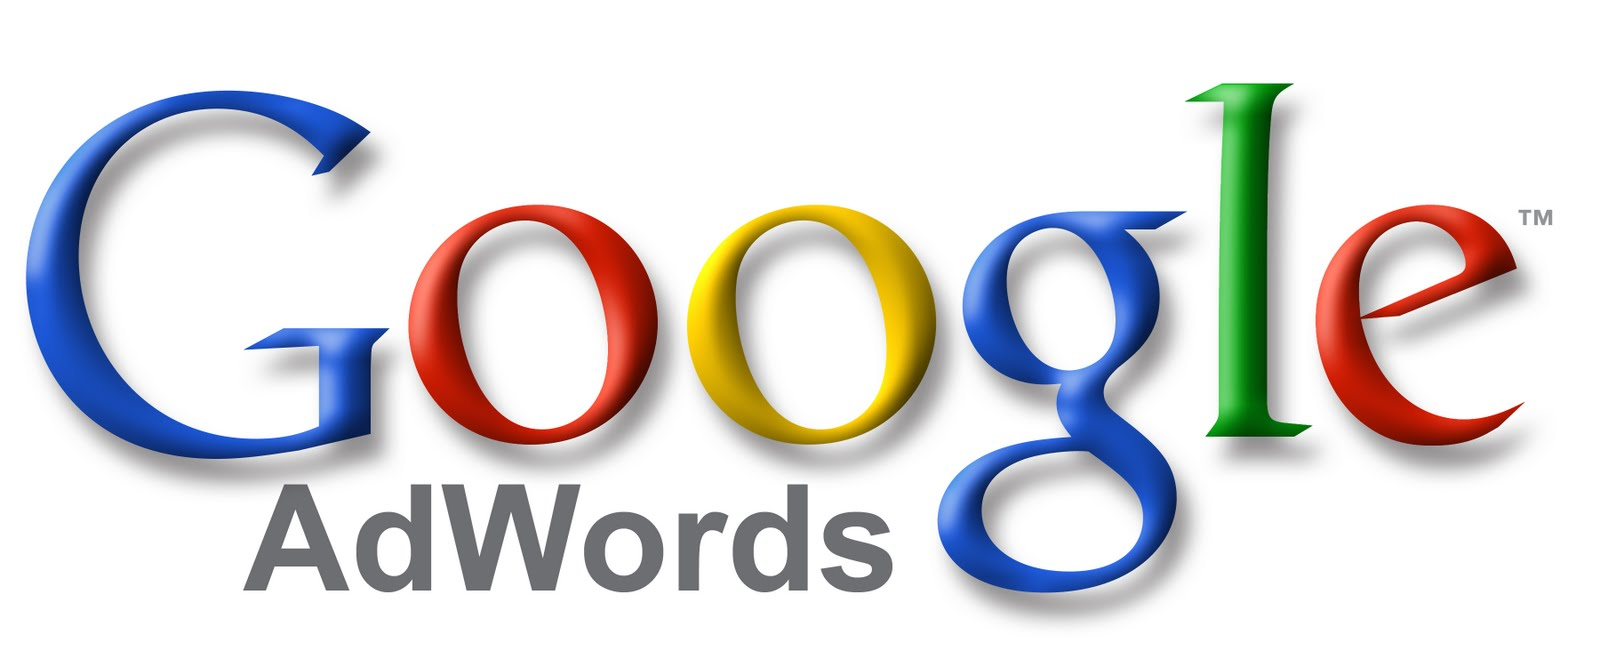 Google AdWords : comment convertir des clics en résultats – Guide PDF